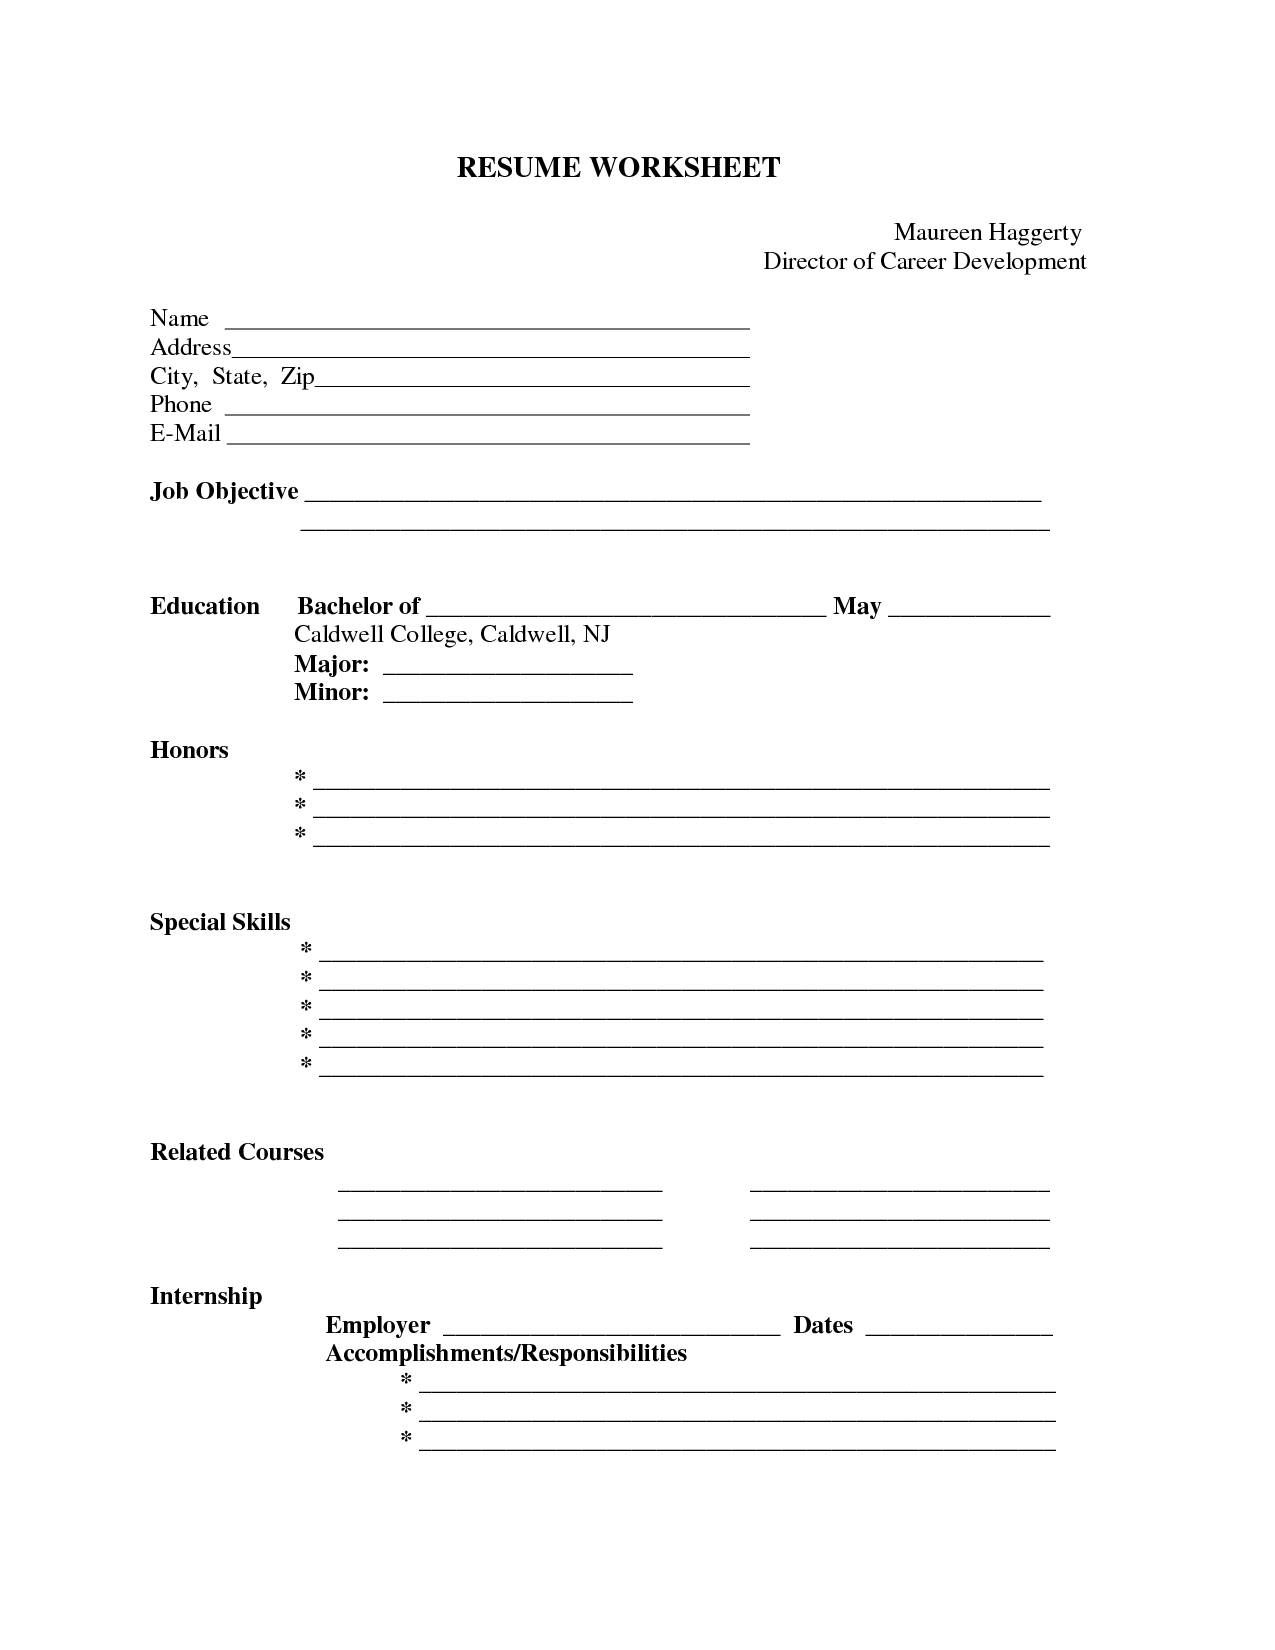 Pin by jobresume on Resume Career termplate free | Pinterest